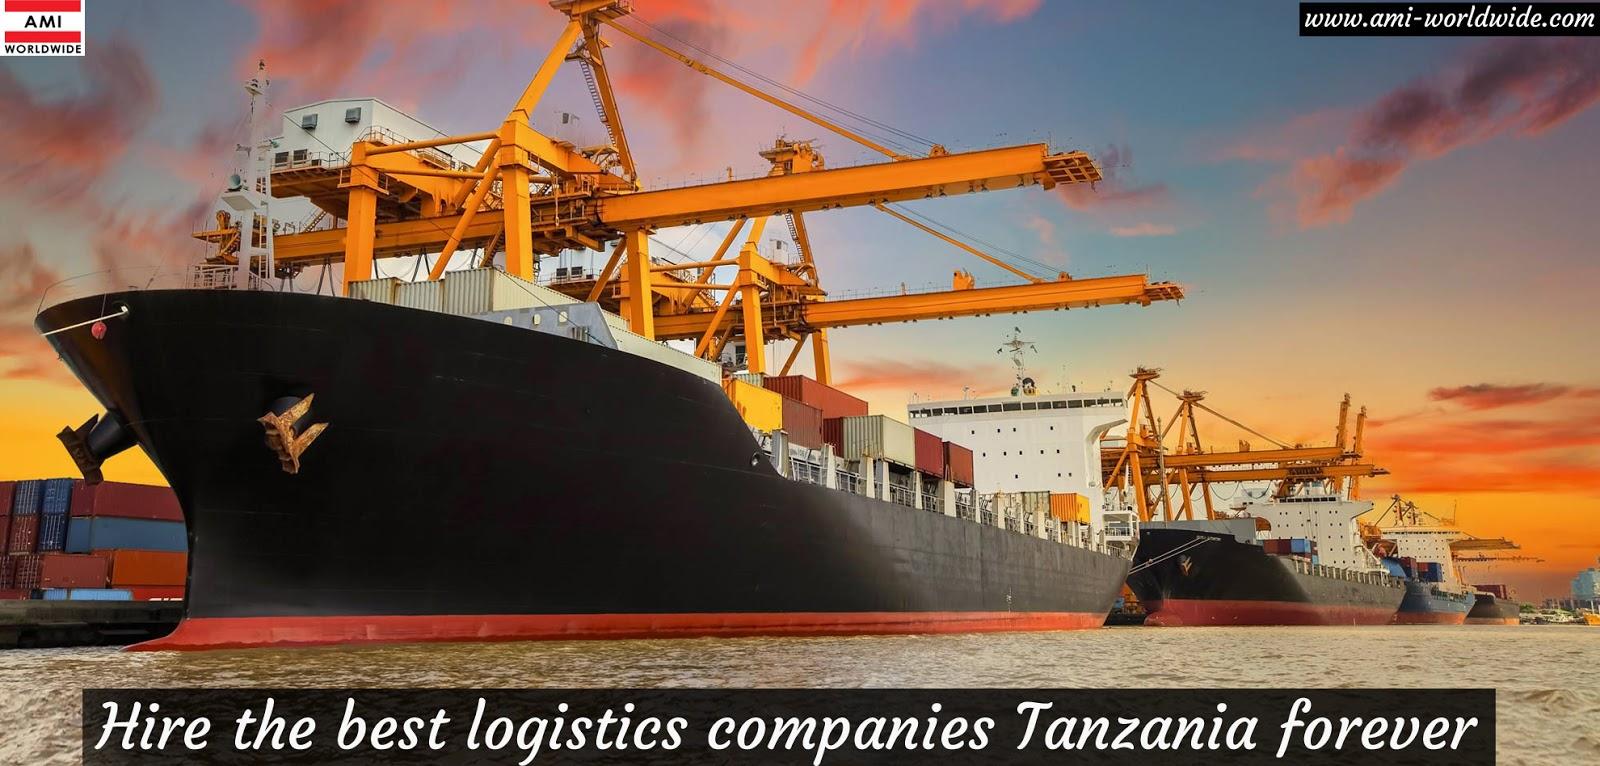 Best Logistics Companies Tanzania